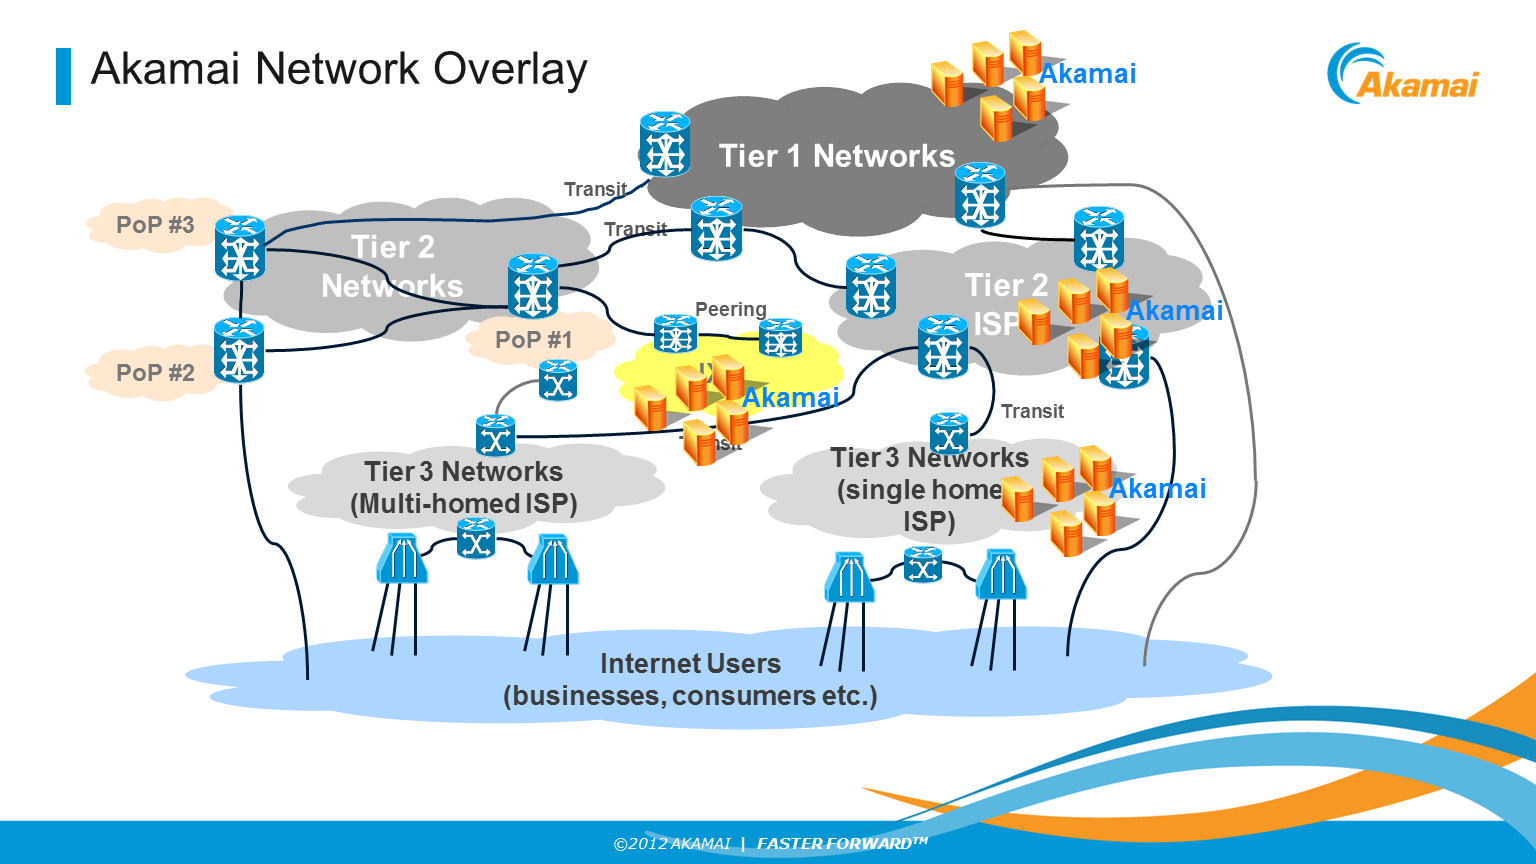 Akamai Network